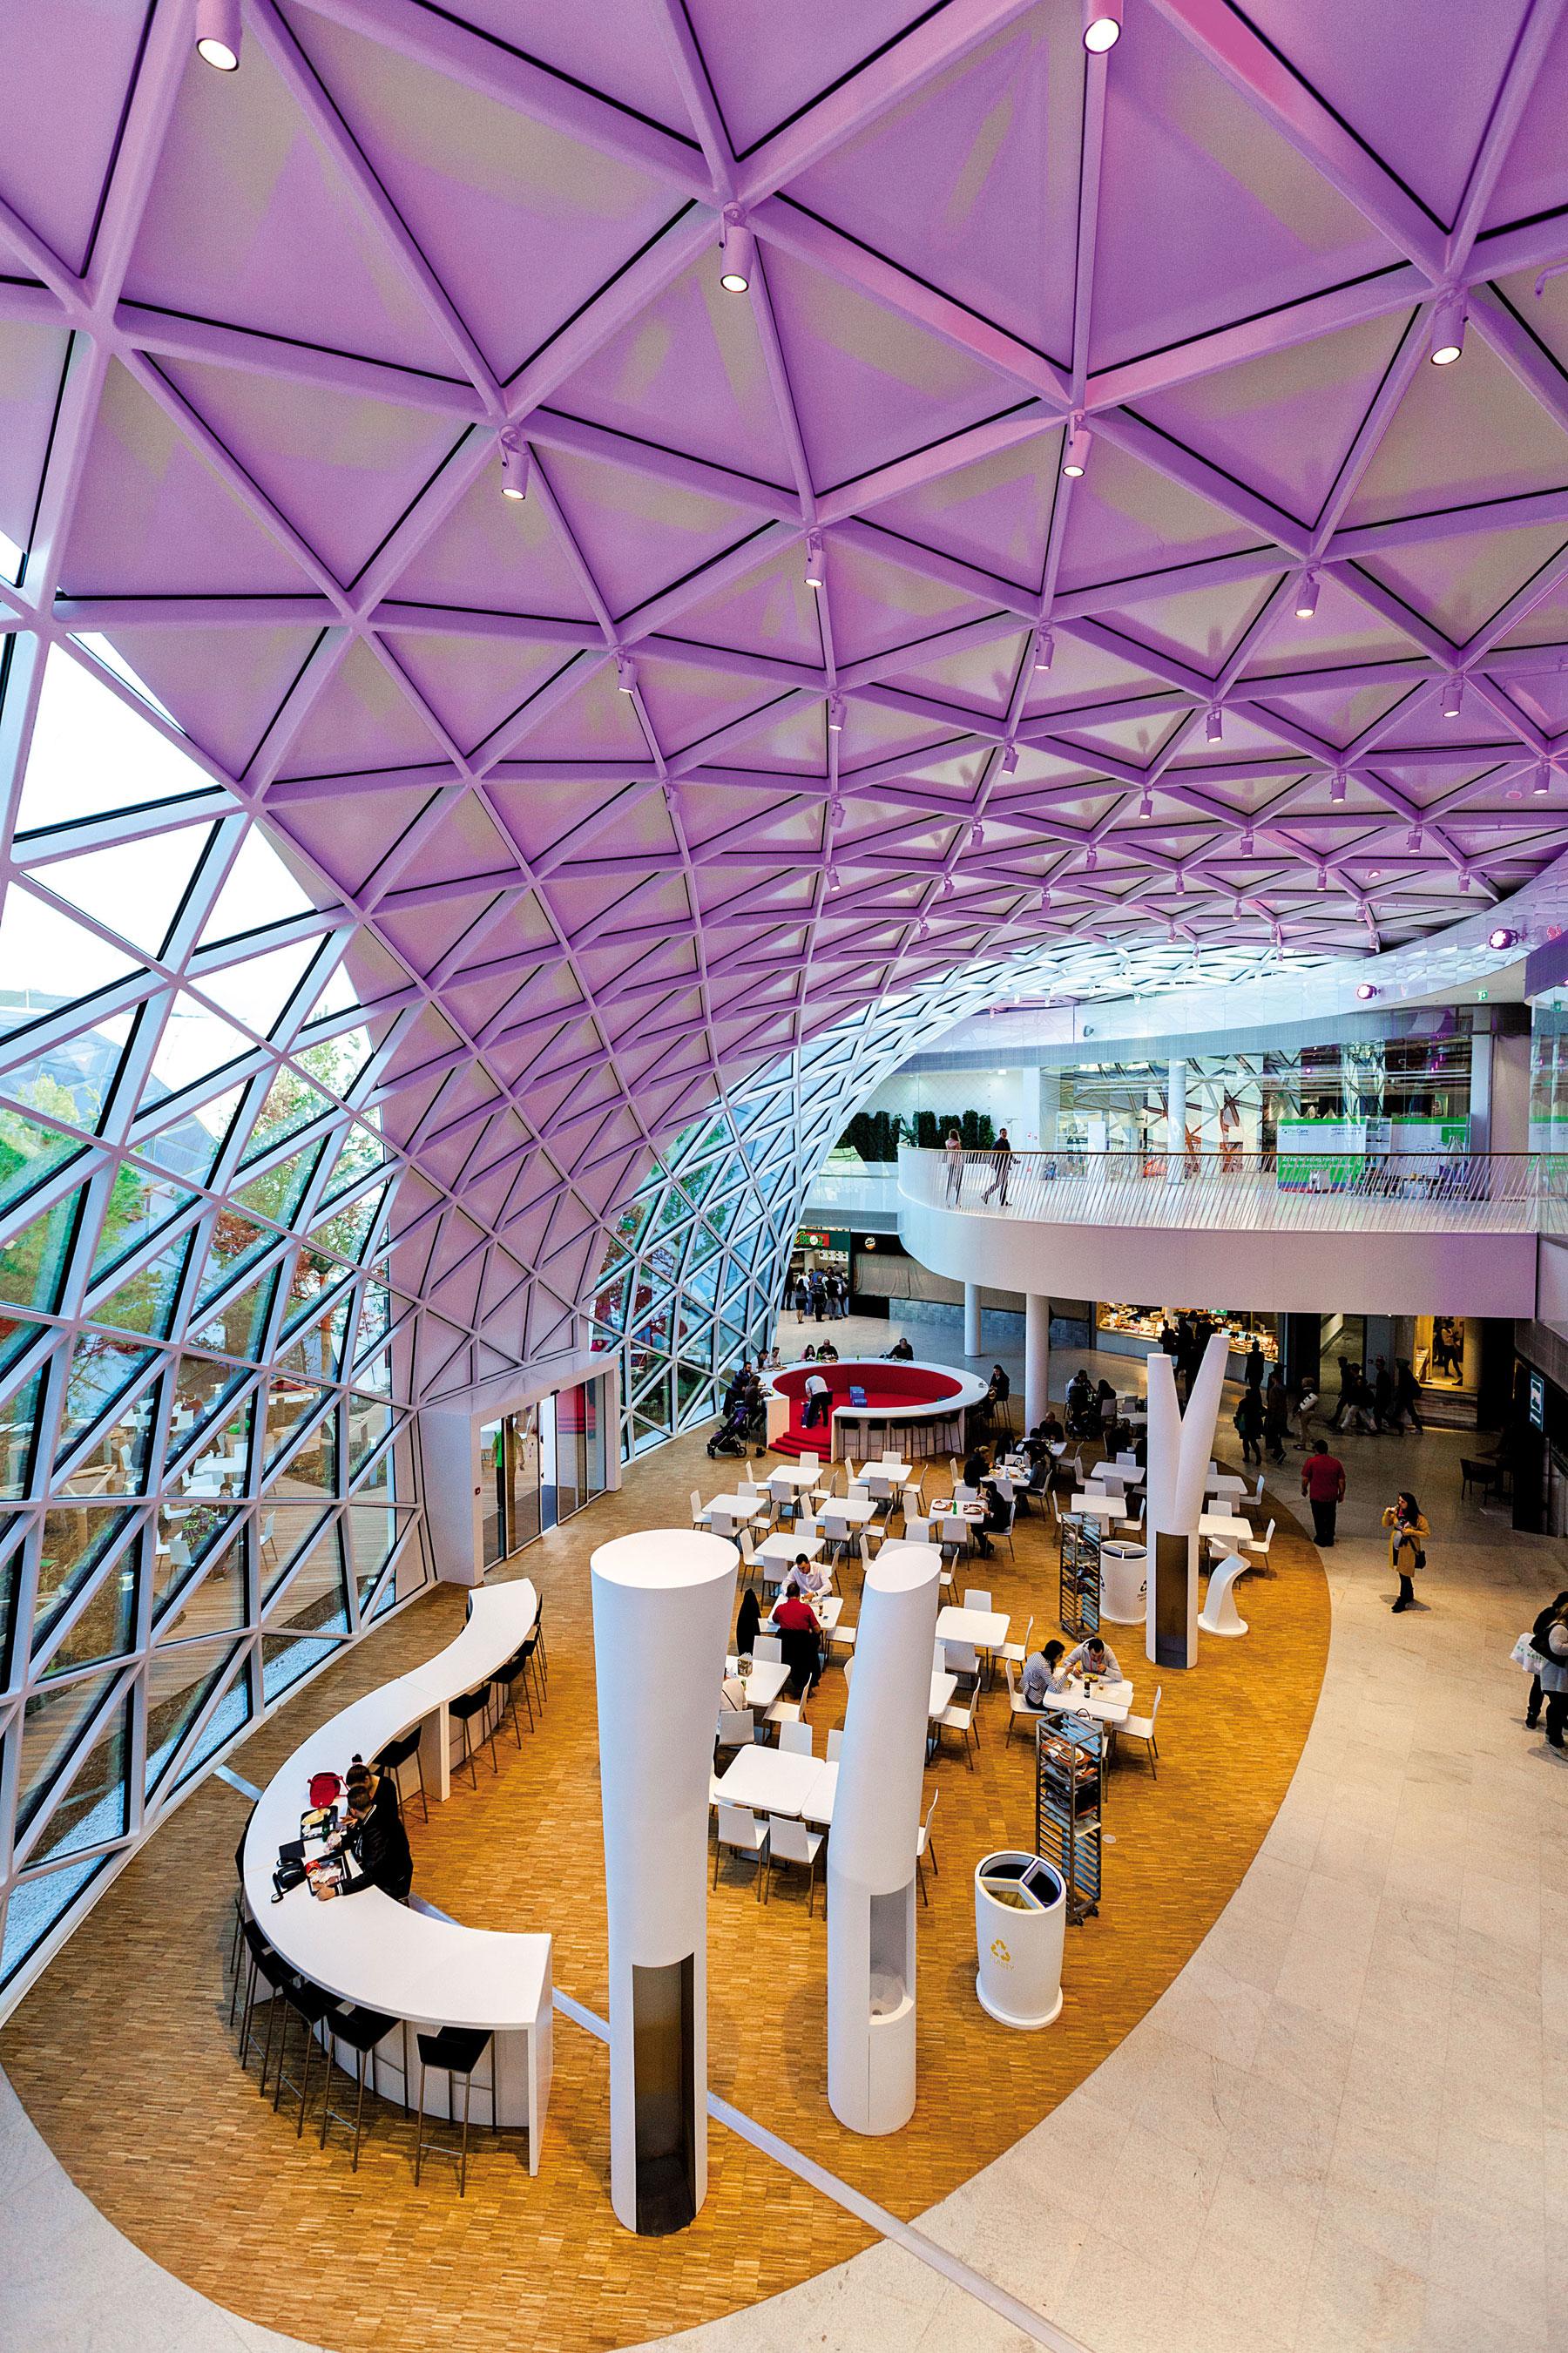 Bory Mall